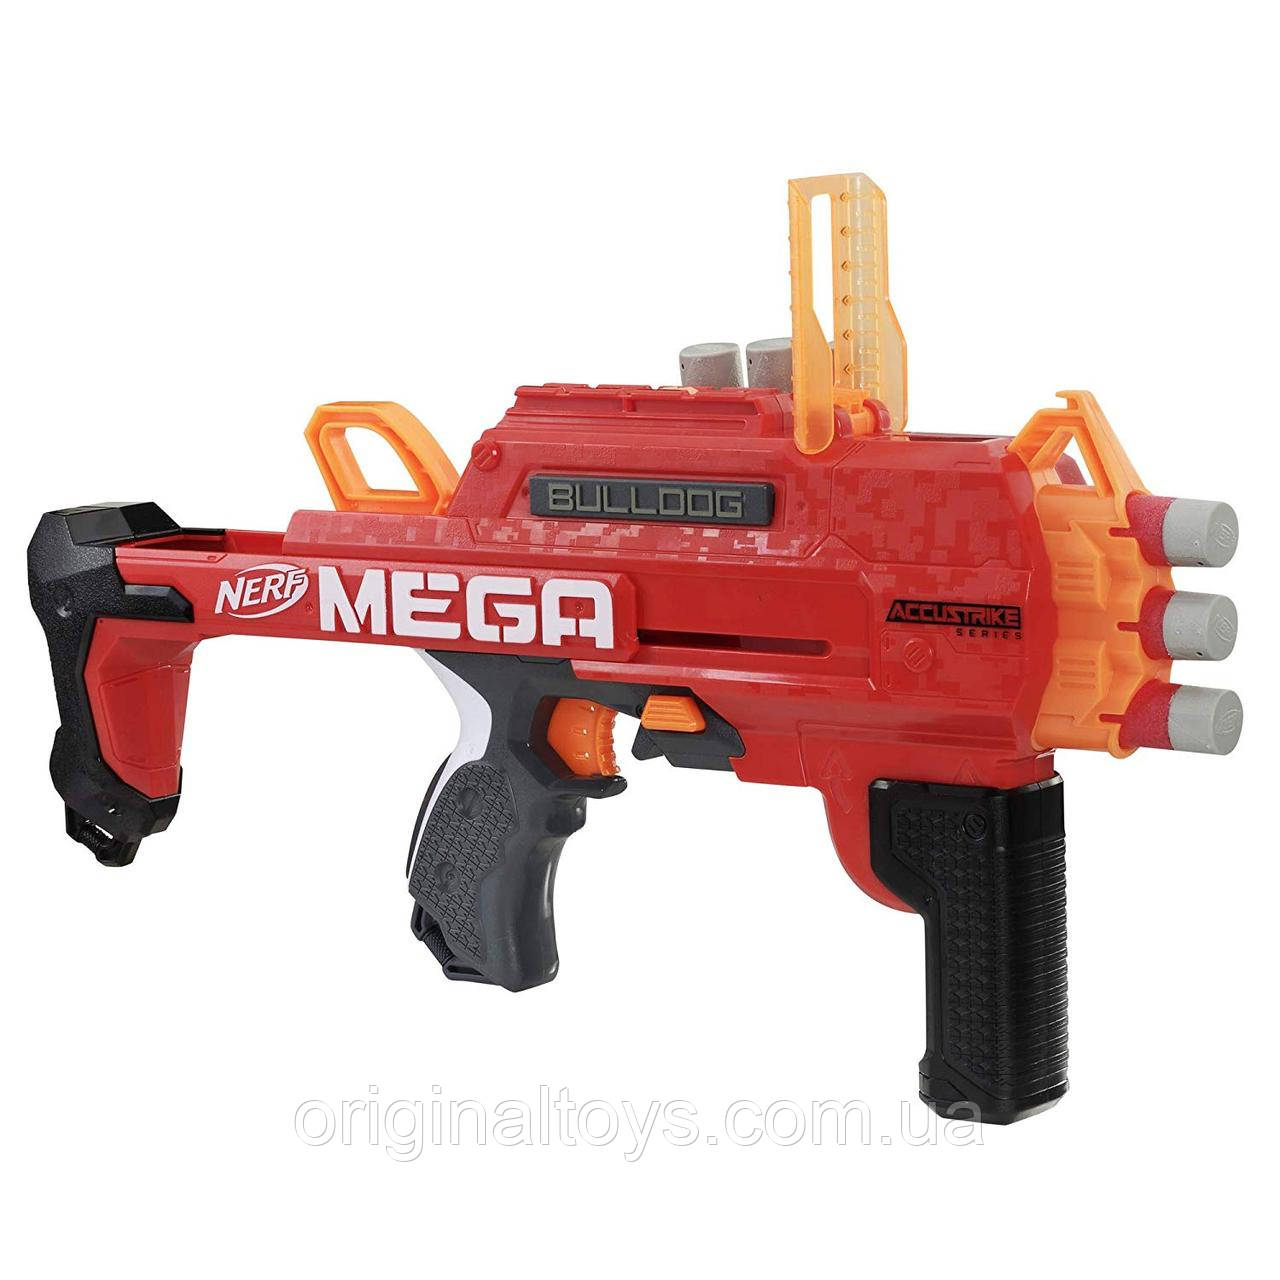 Бластер Nerf Нерф Accustrike Mega Bulldog Hasbro E2657